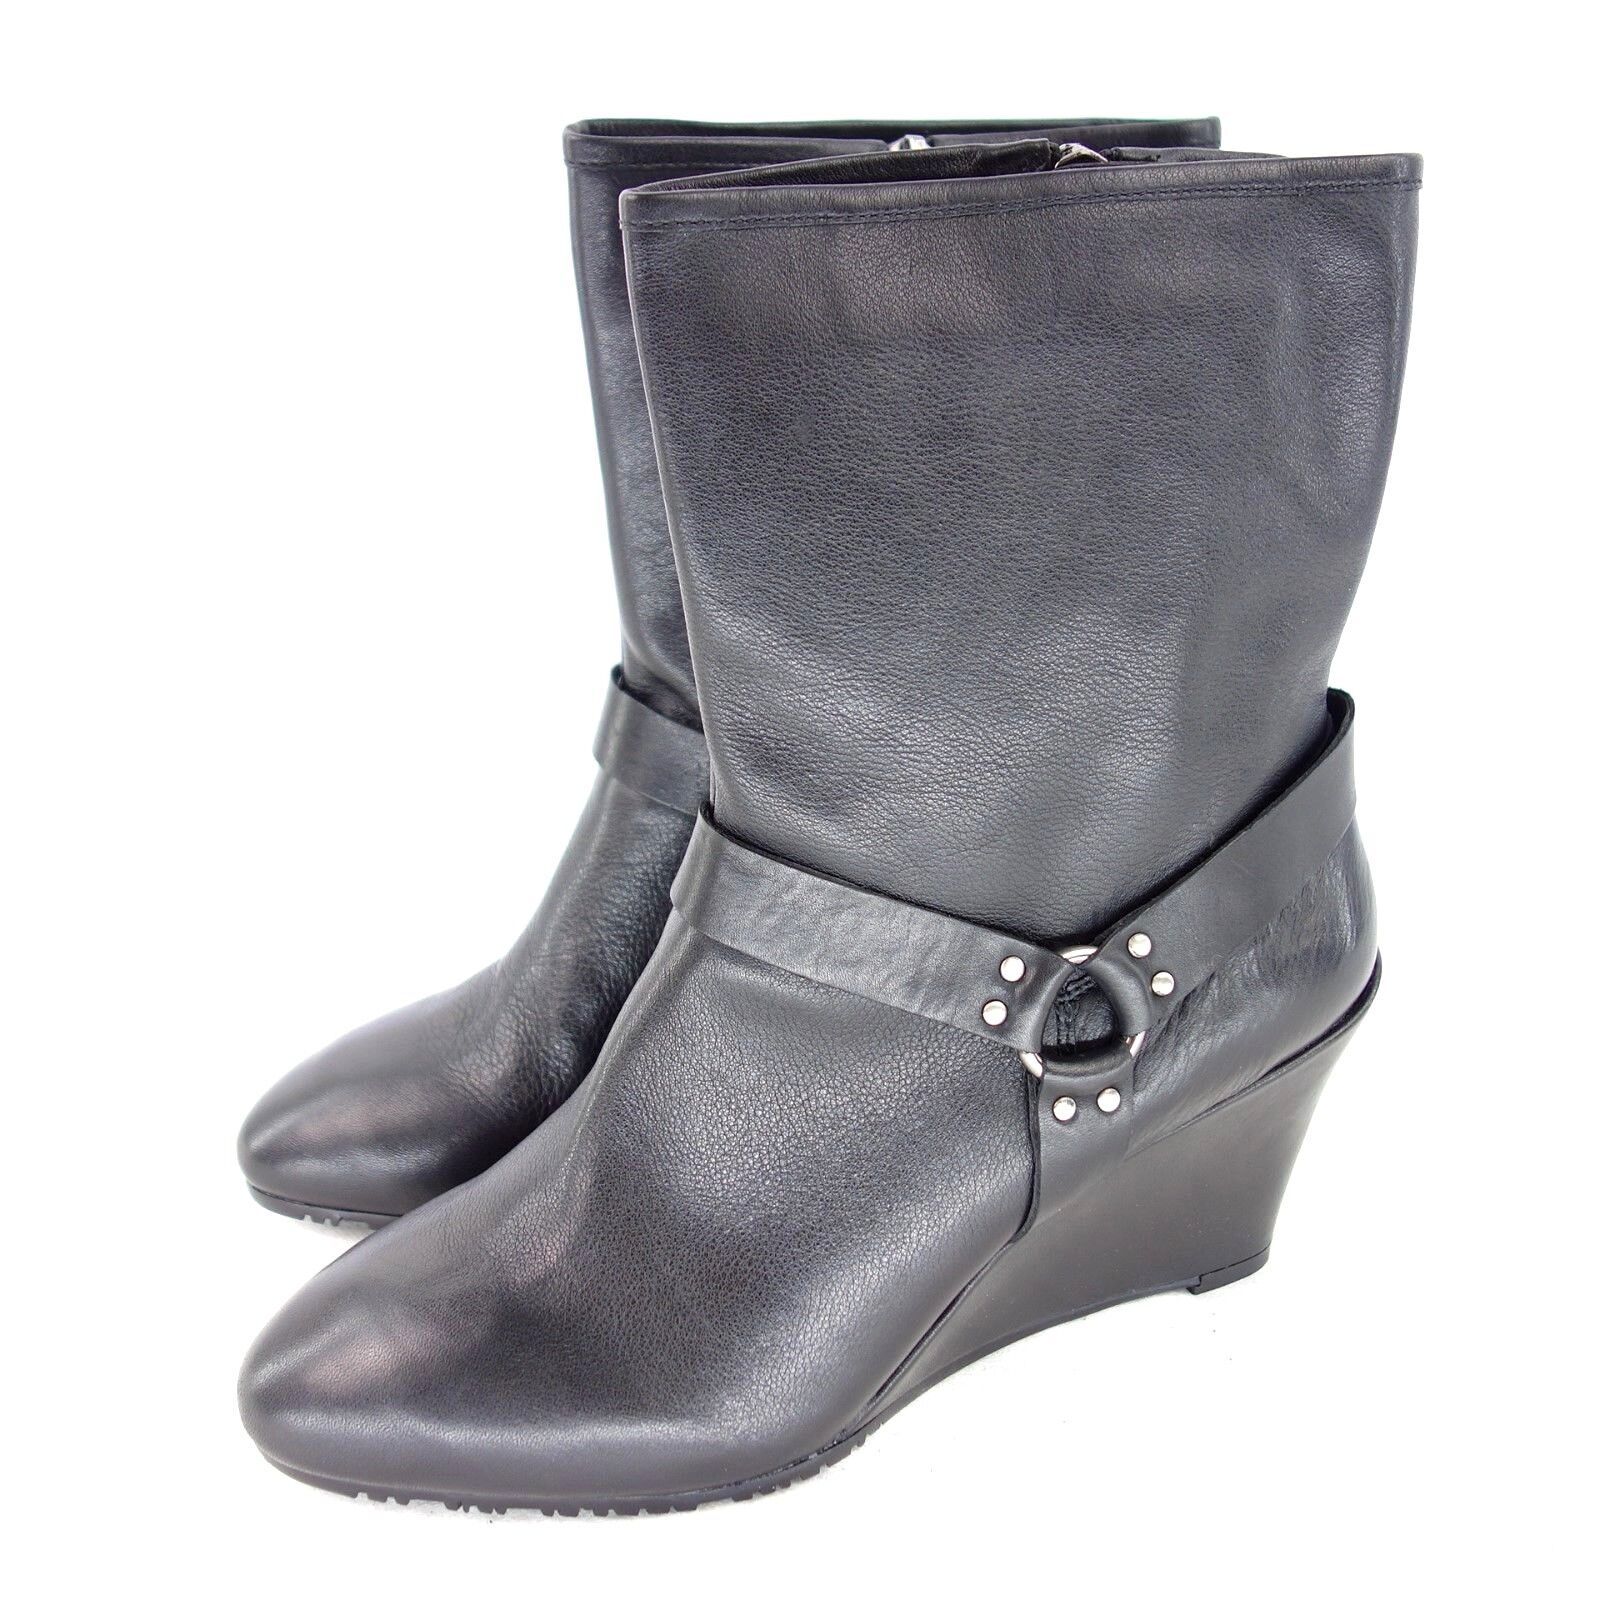 Damens Schuhe KARAN DKNY Damen Stiefeletten Schuhe Damens CICILY Schwarz Leder Keil NP 189 NEU 8dda7b